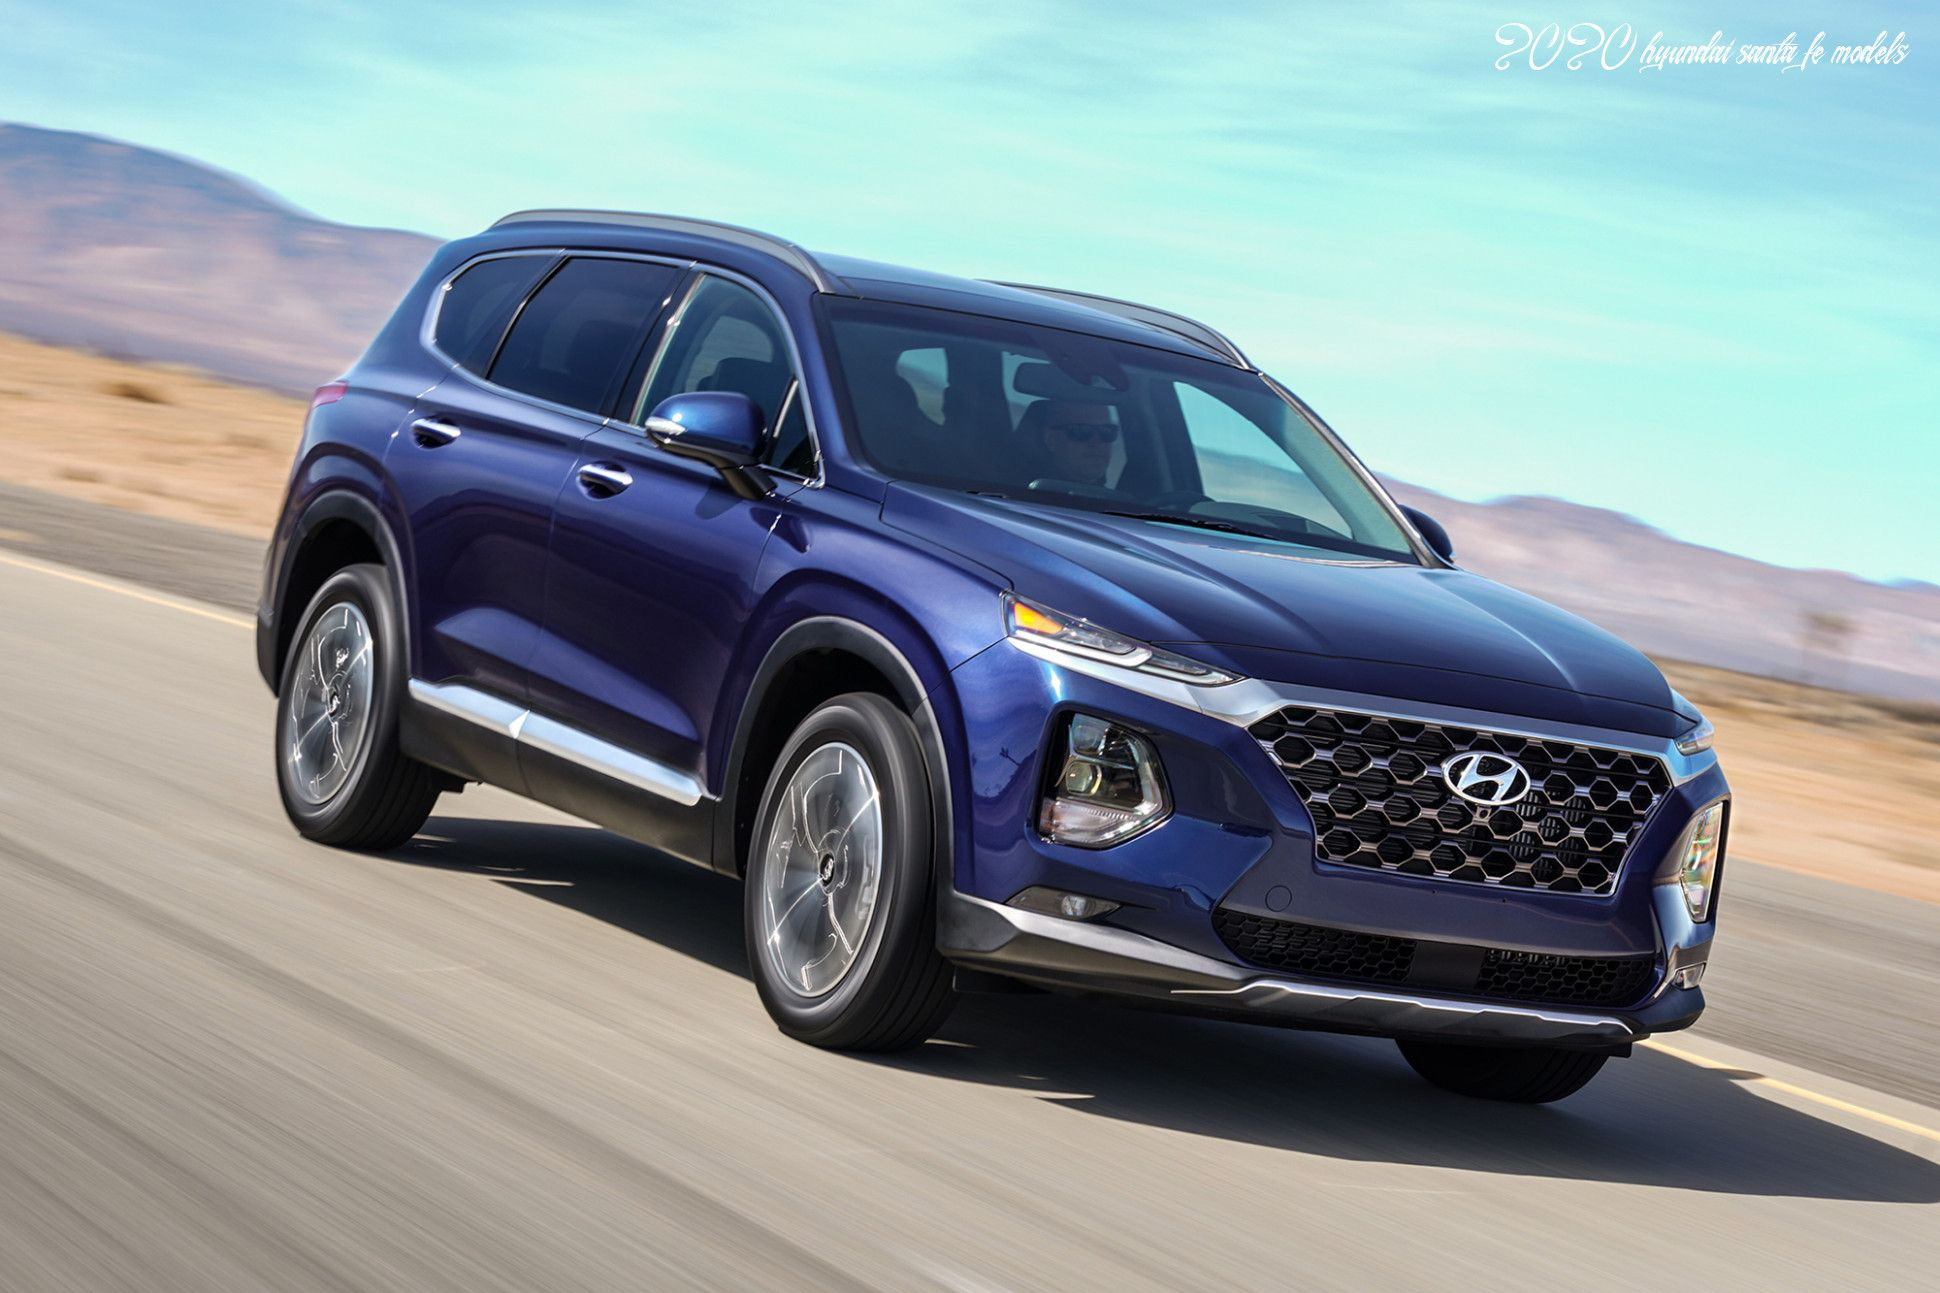 2020 Hyundai Santa Fe Models New Concept In 2020 Hyundai Santa Fe Hyundai Santa Fe Sport Hyundai